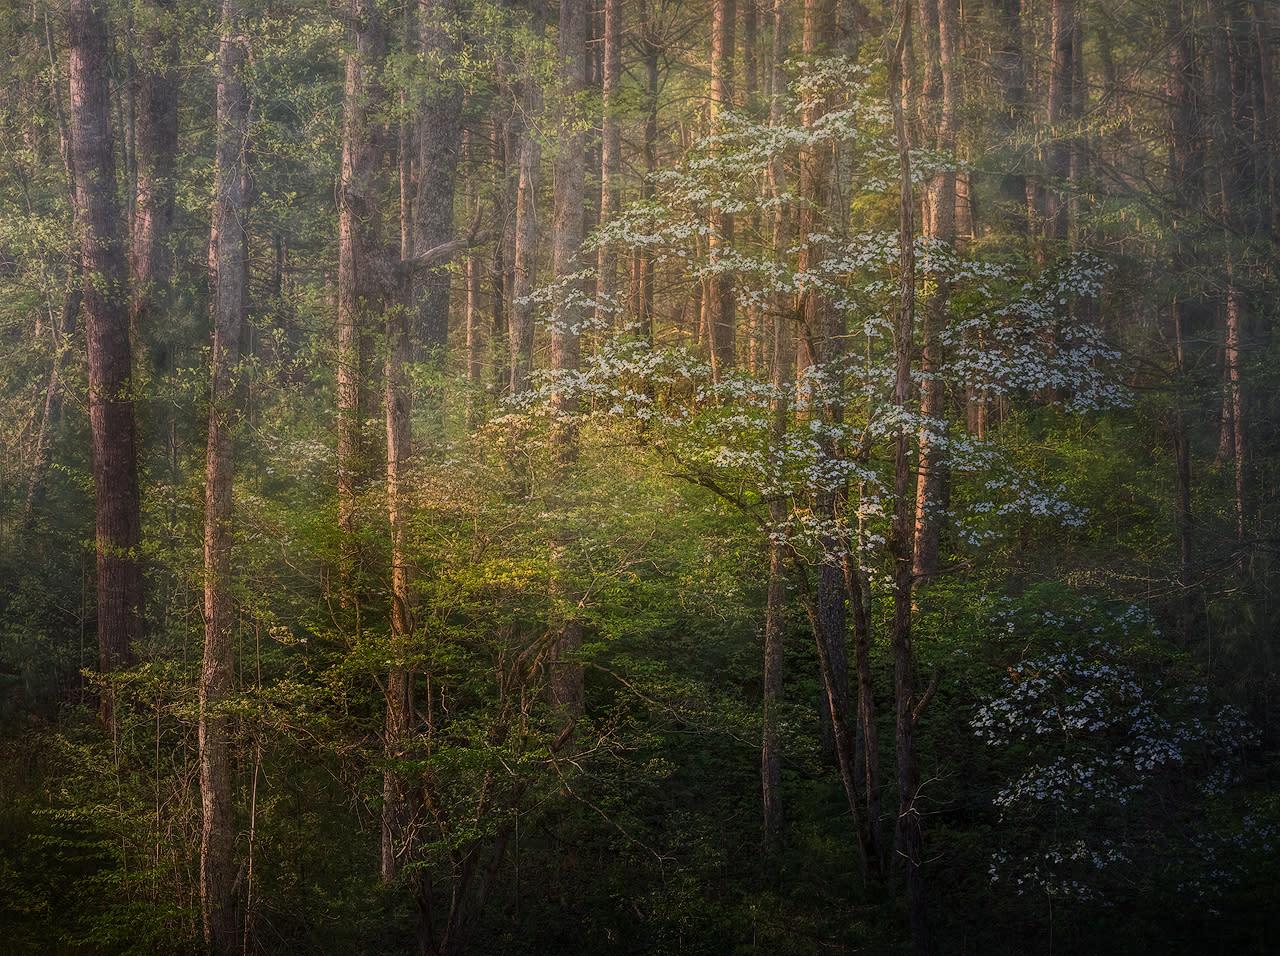 Smoky mountains spring k89wg2